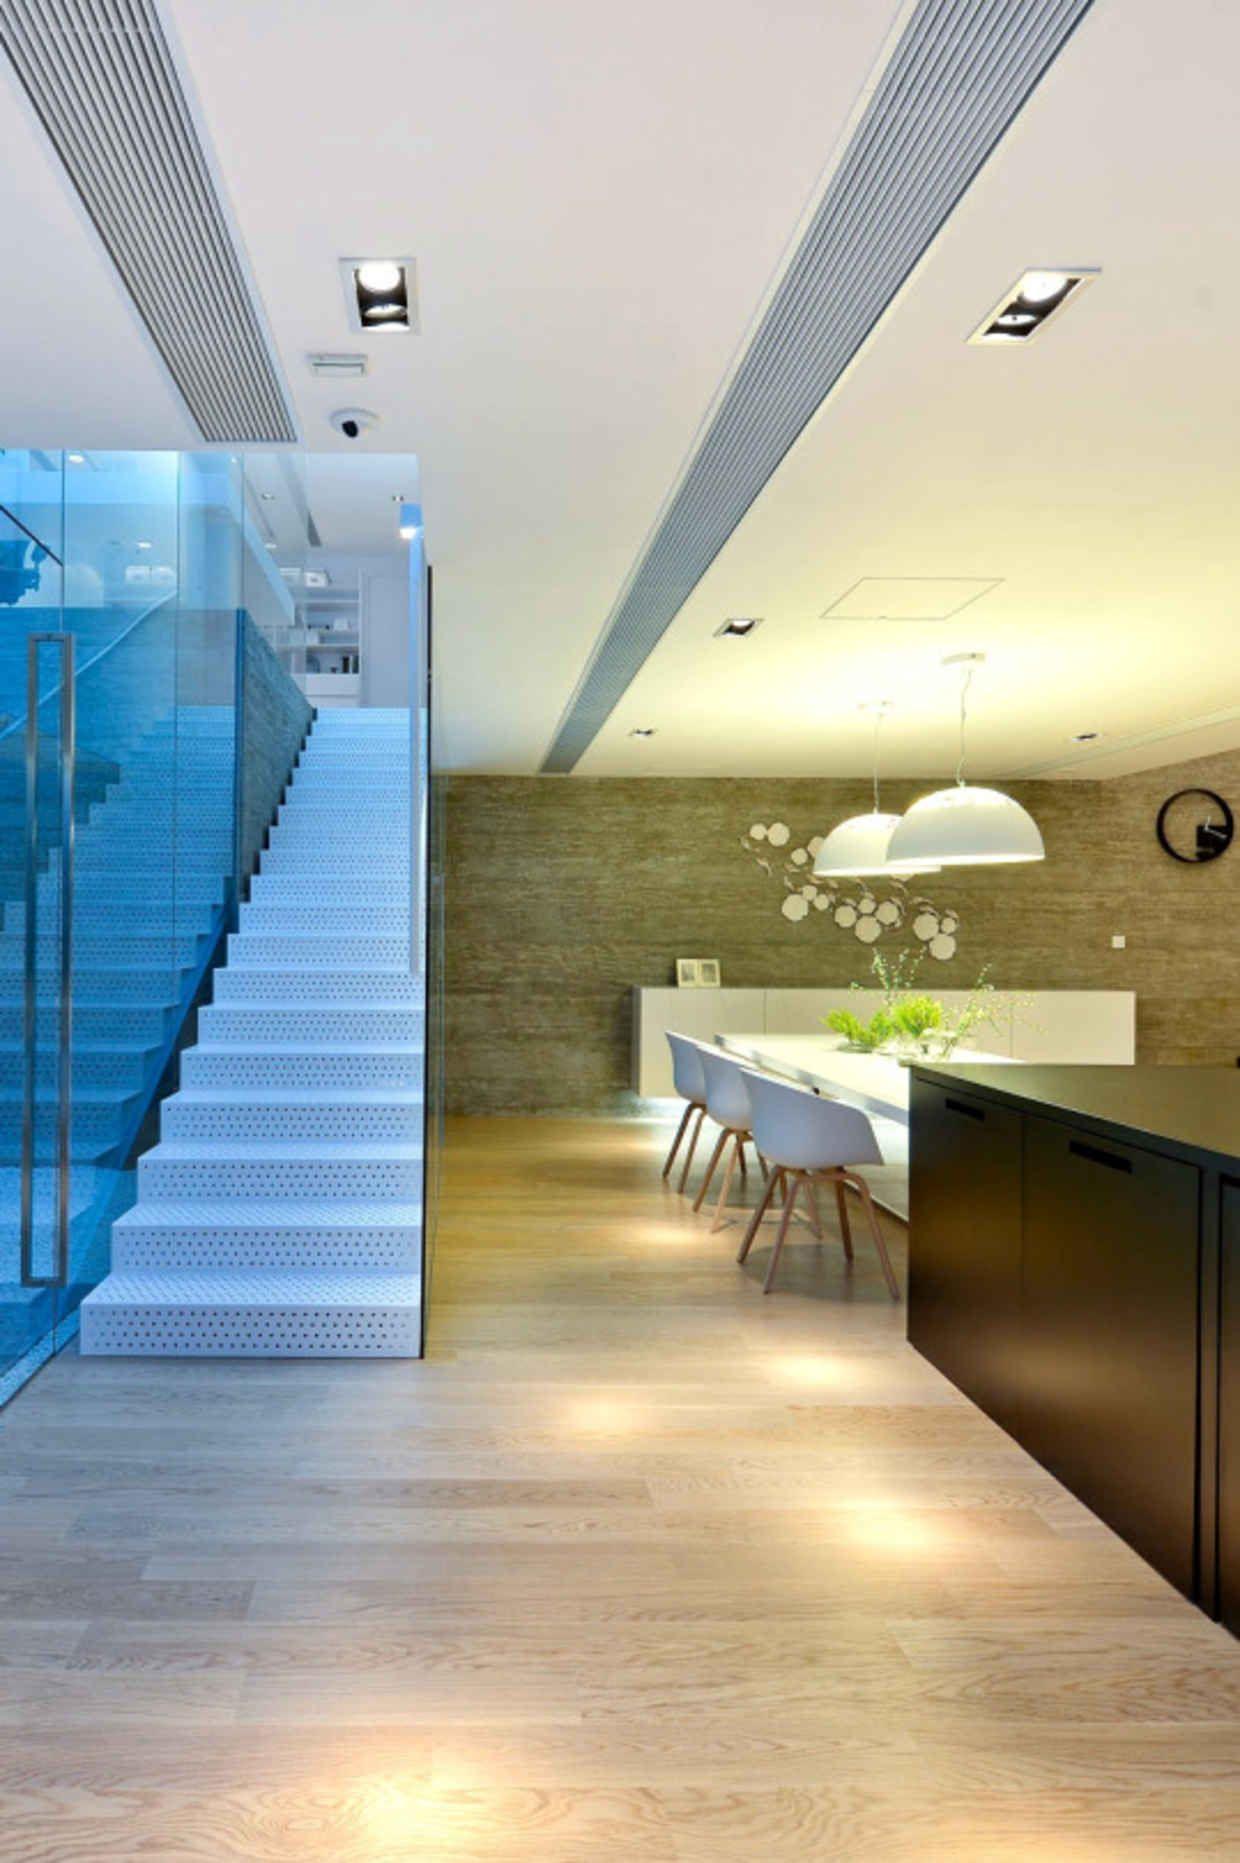 Inspiring examples of minimal interior design minimal and interiors